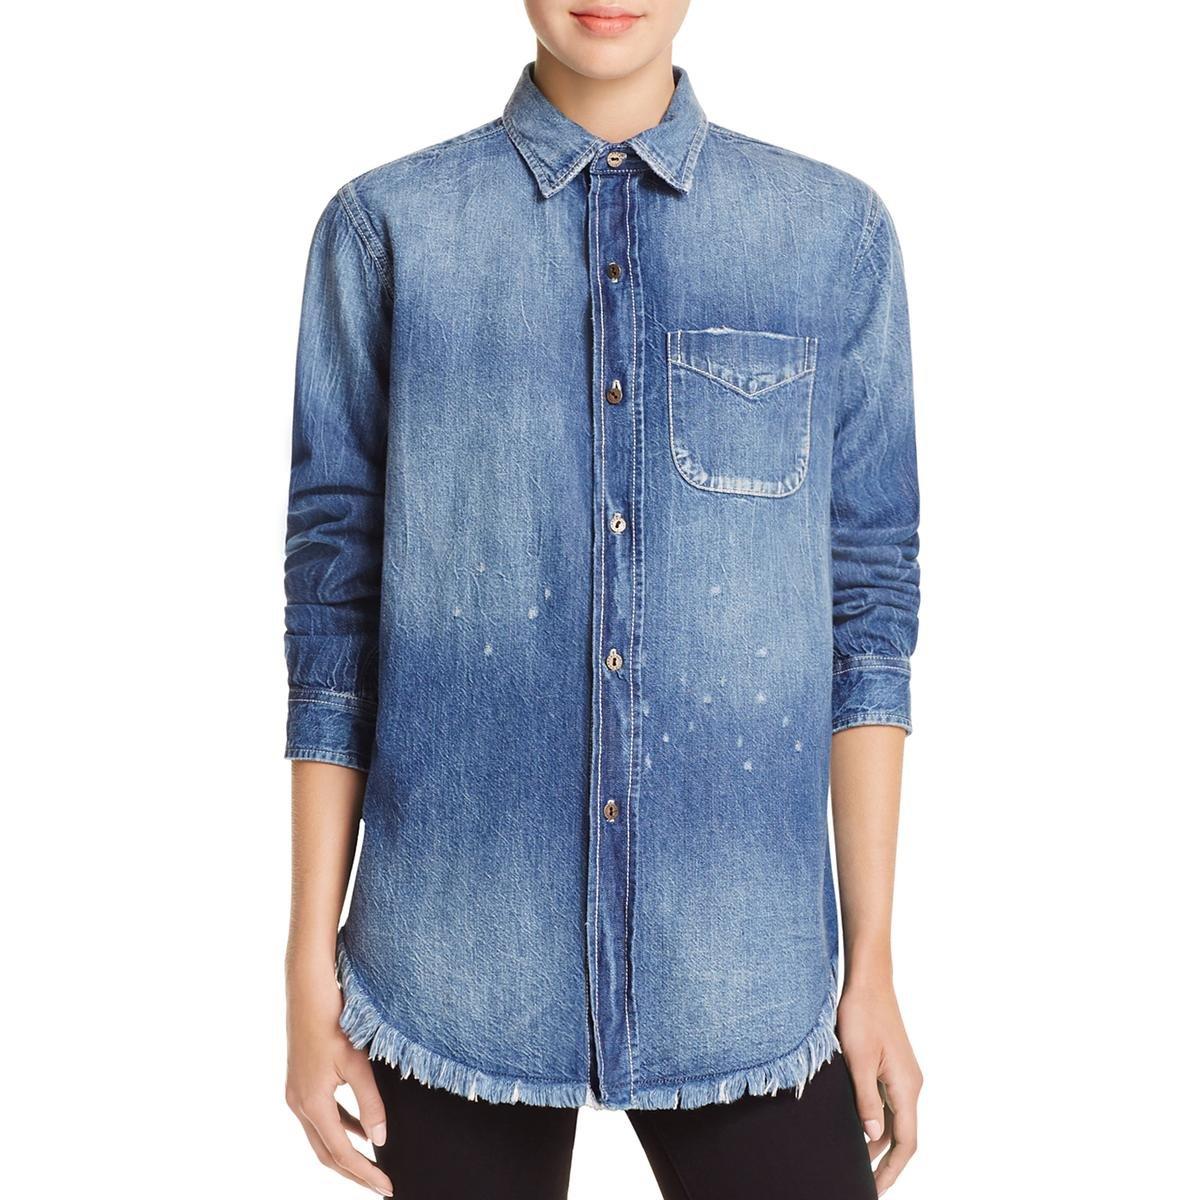 Current/Elliott Womens Collared Button-Down Denim Shirt Blue 2